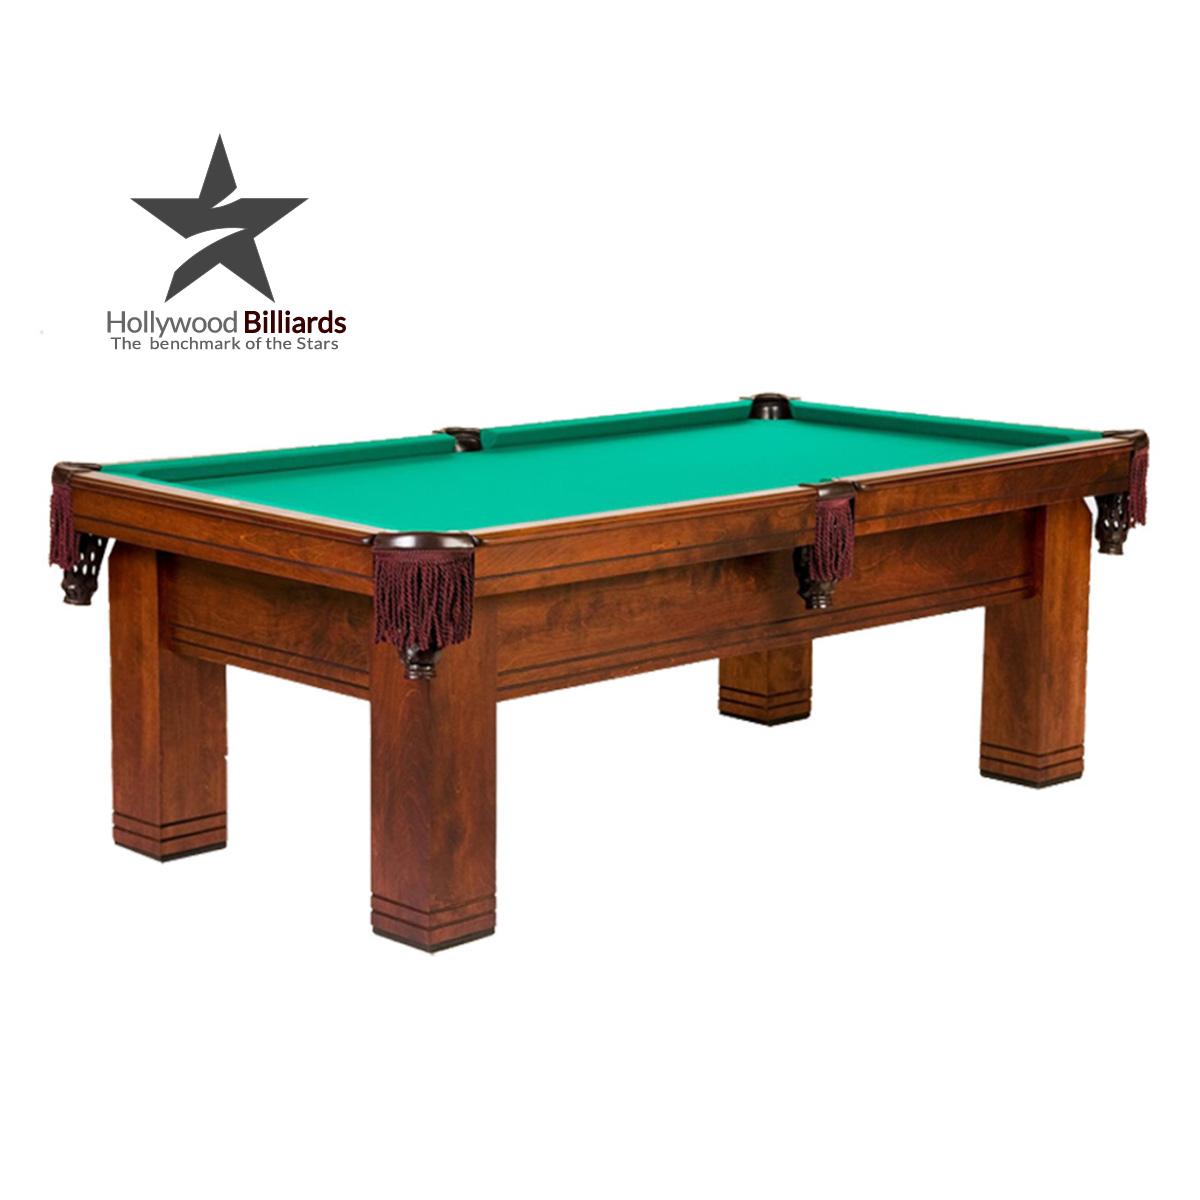 The Coronado Classic Pool Table